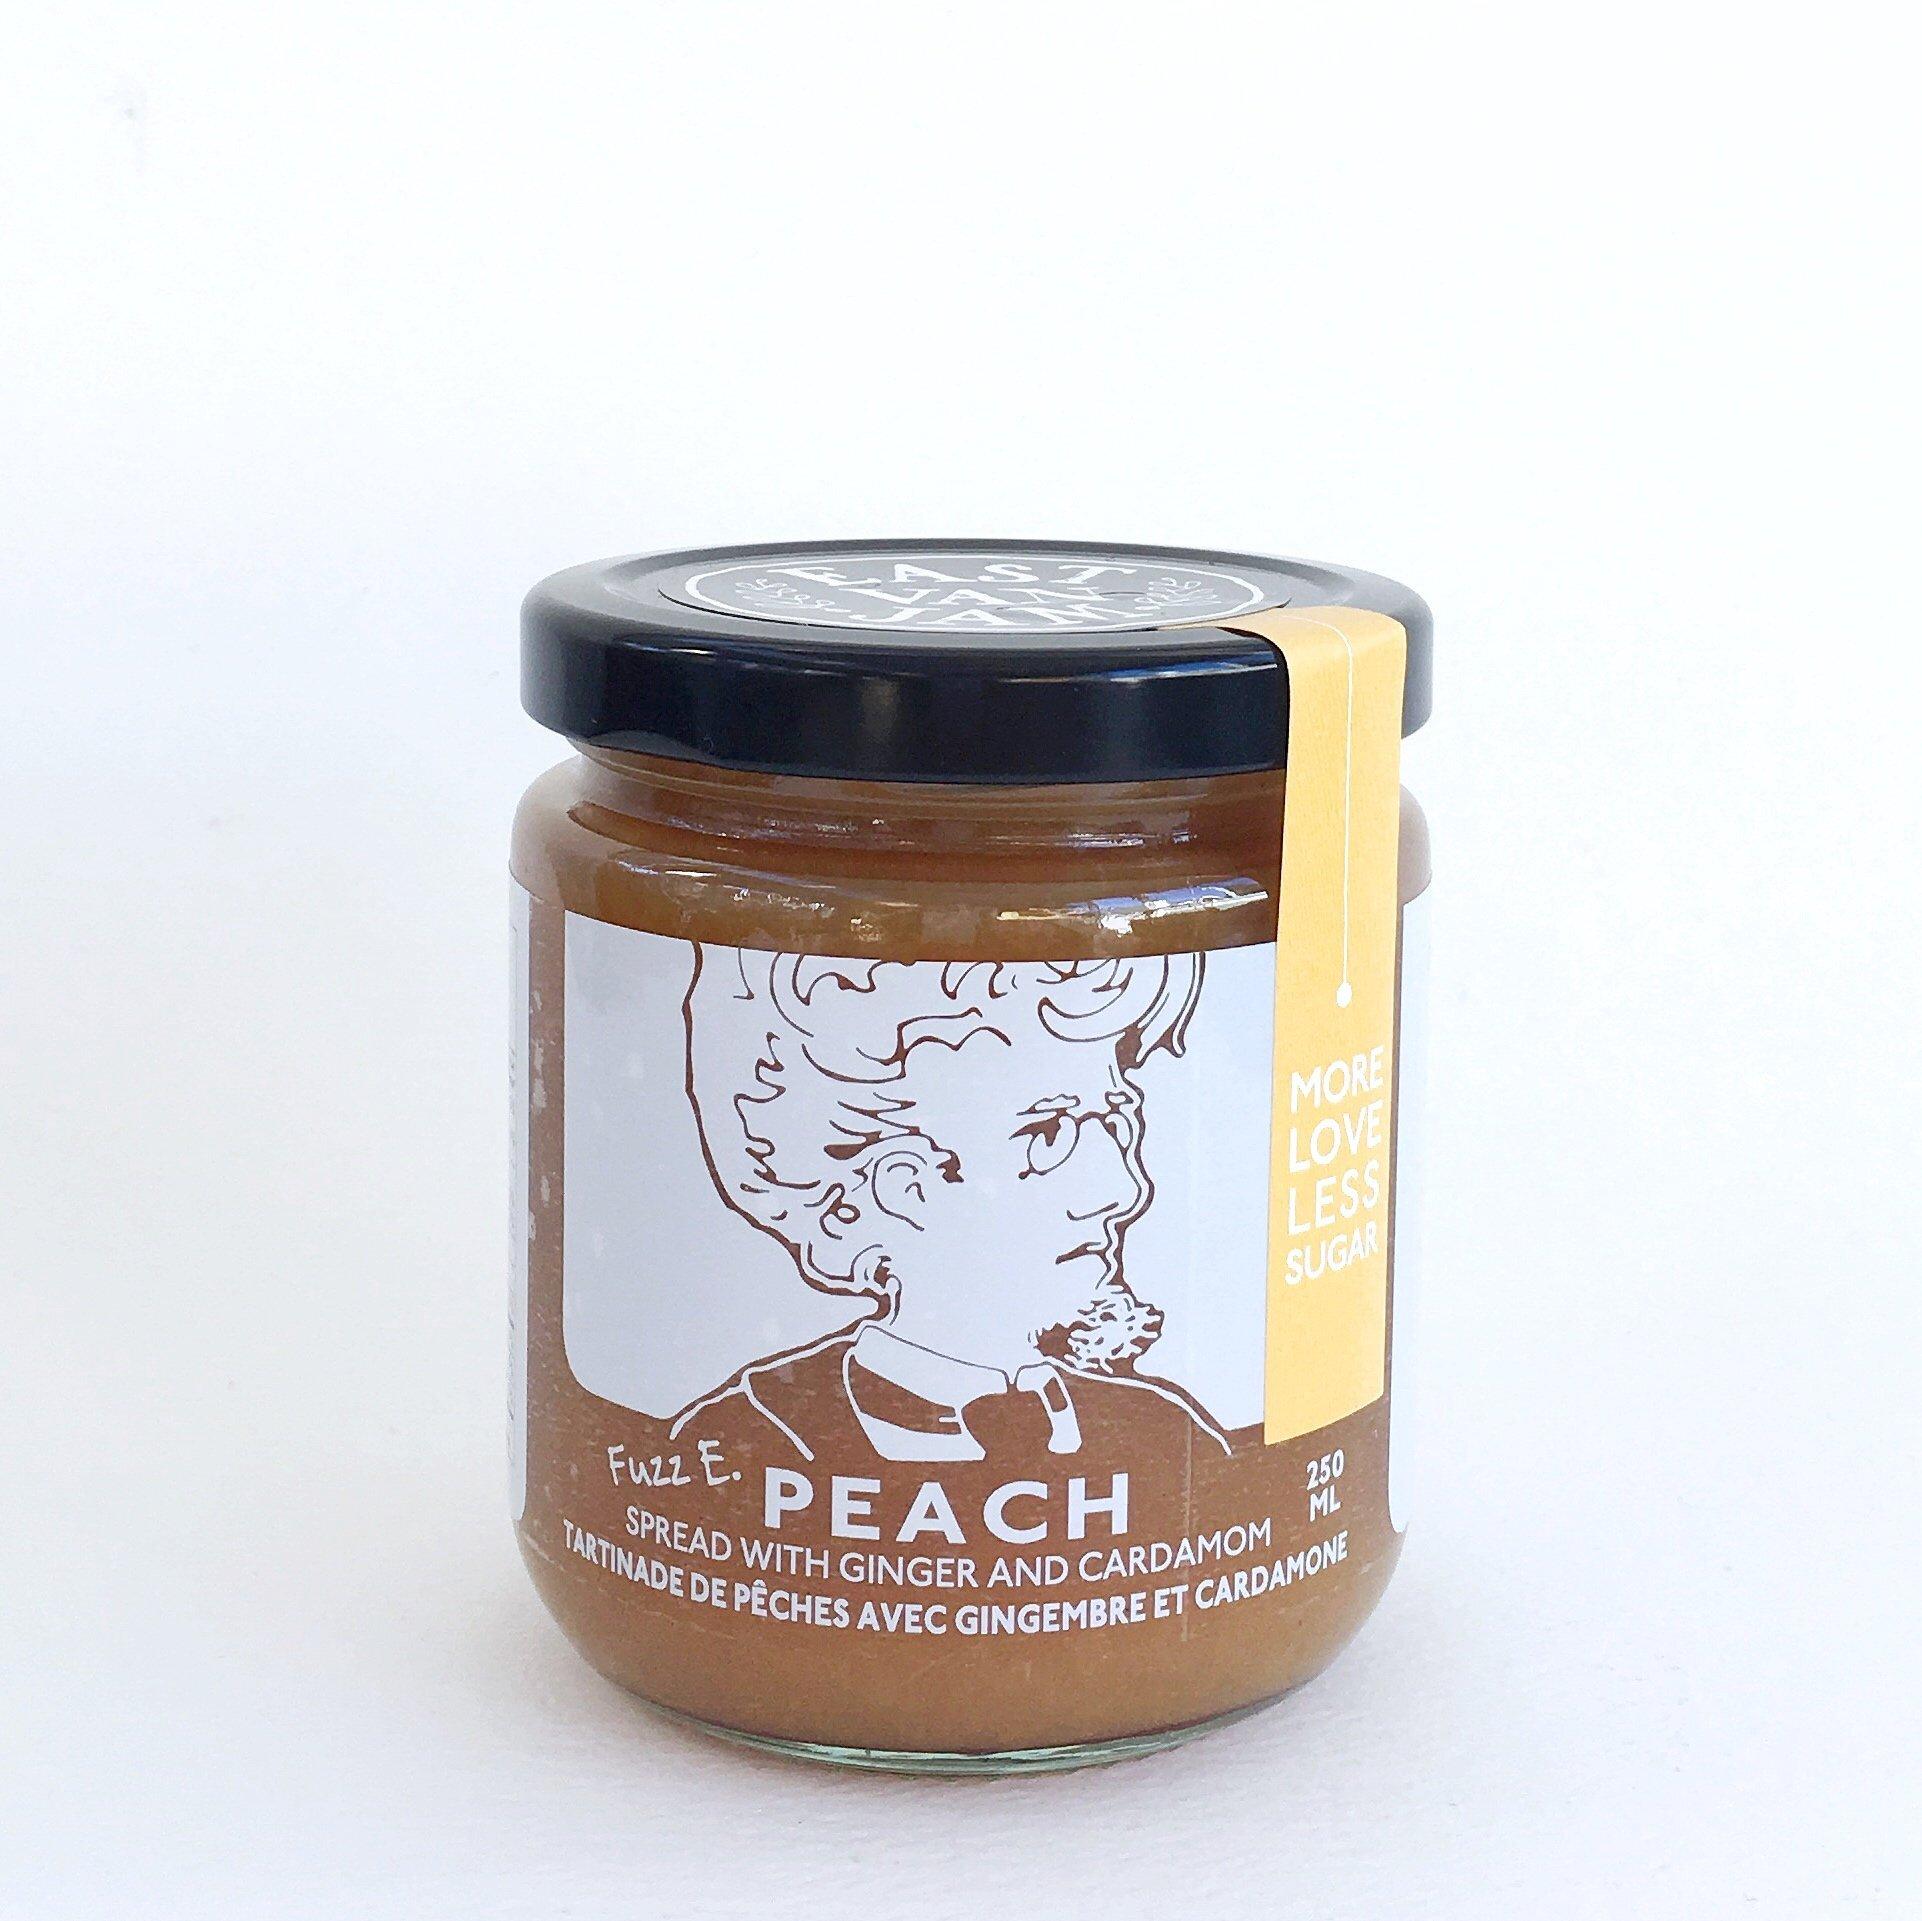 East Van Jam Peach with Ginger + Cardamom